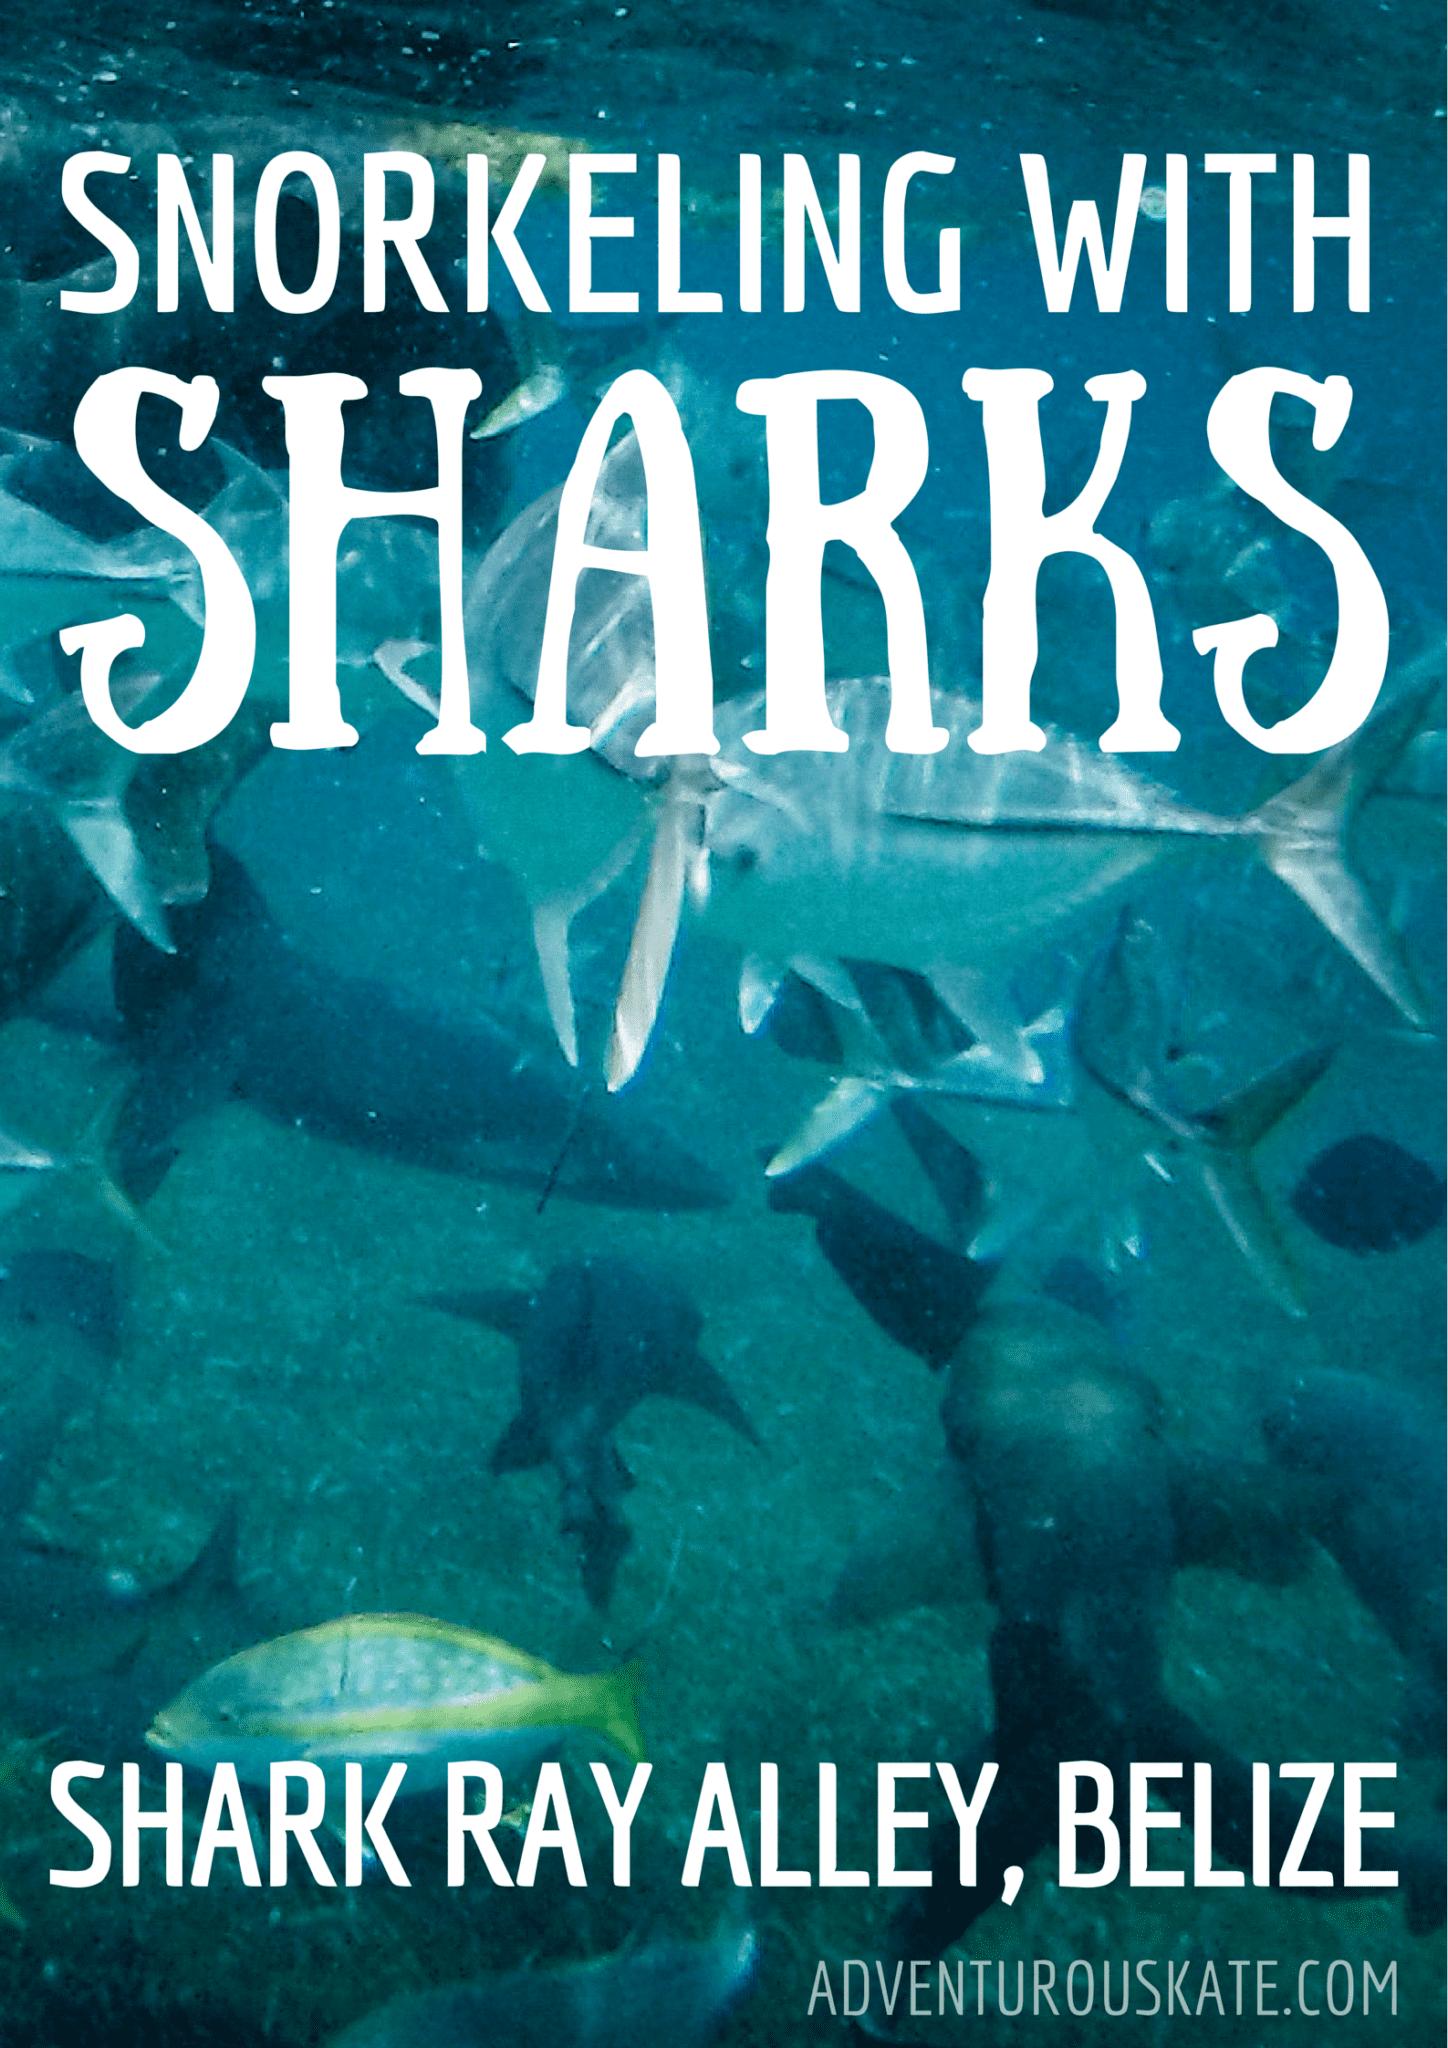 Snorkeling with Sharks in Belize! via Adventurous Kate